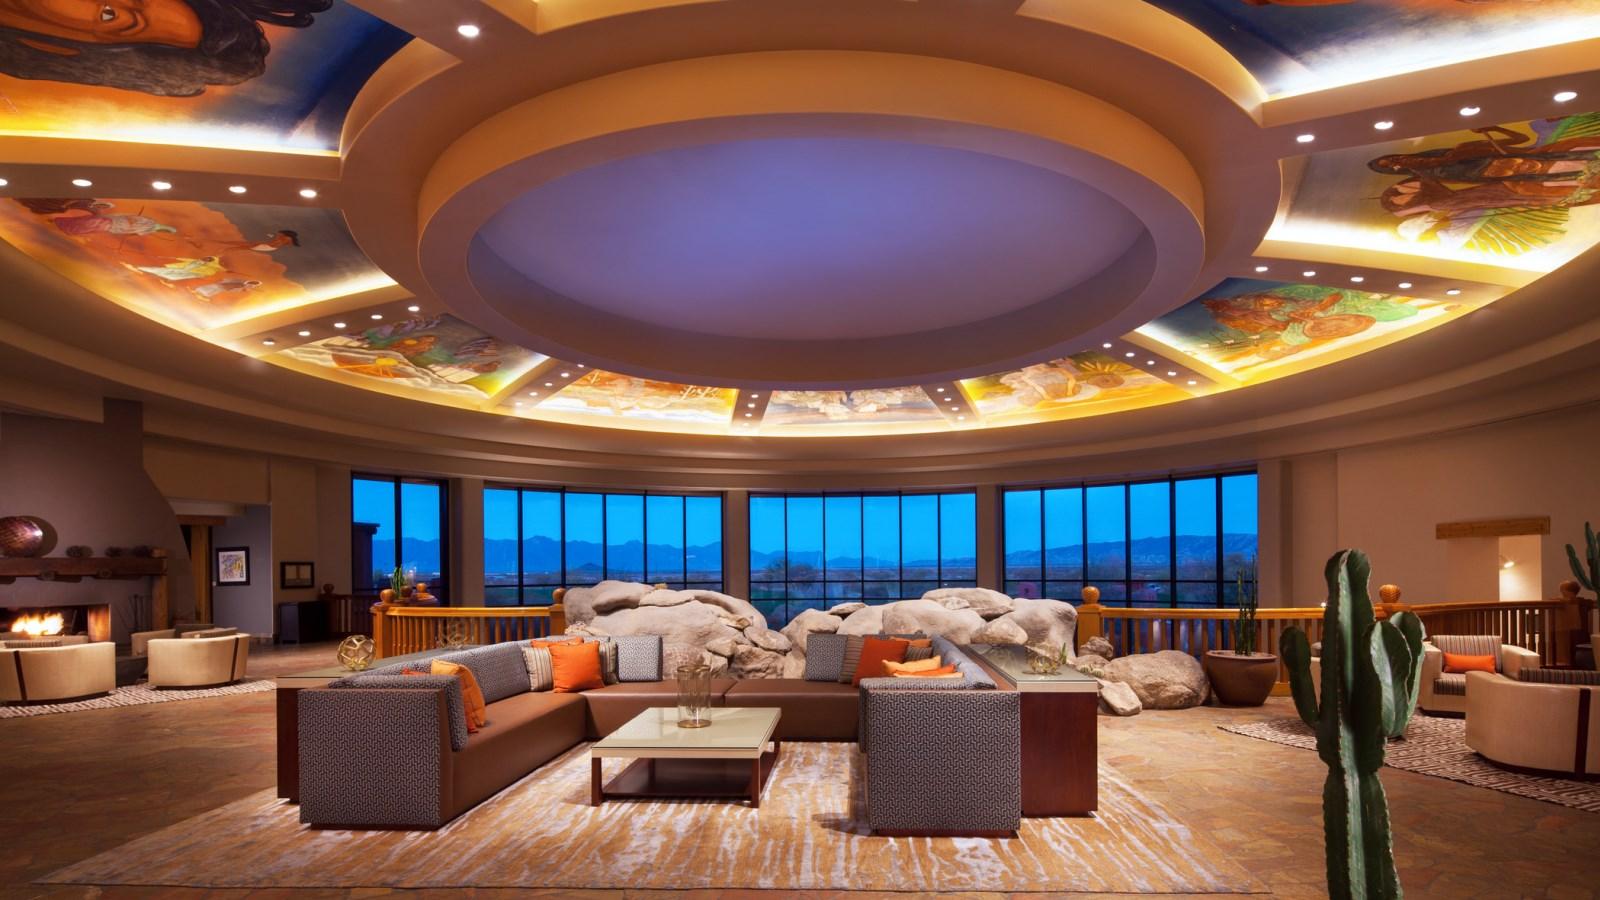 Sheraton hotels resorts recognizes sheraton wild horse pass resort spa as the first sheraton grand resort in north america